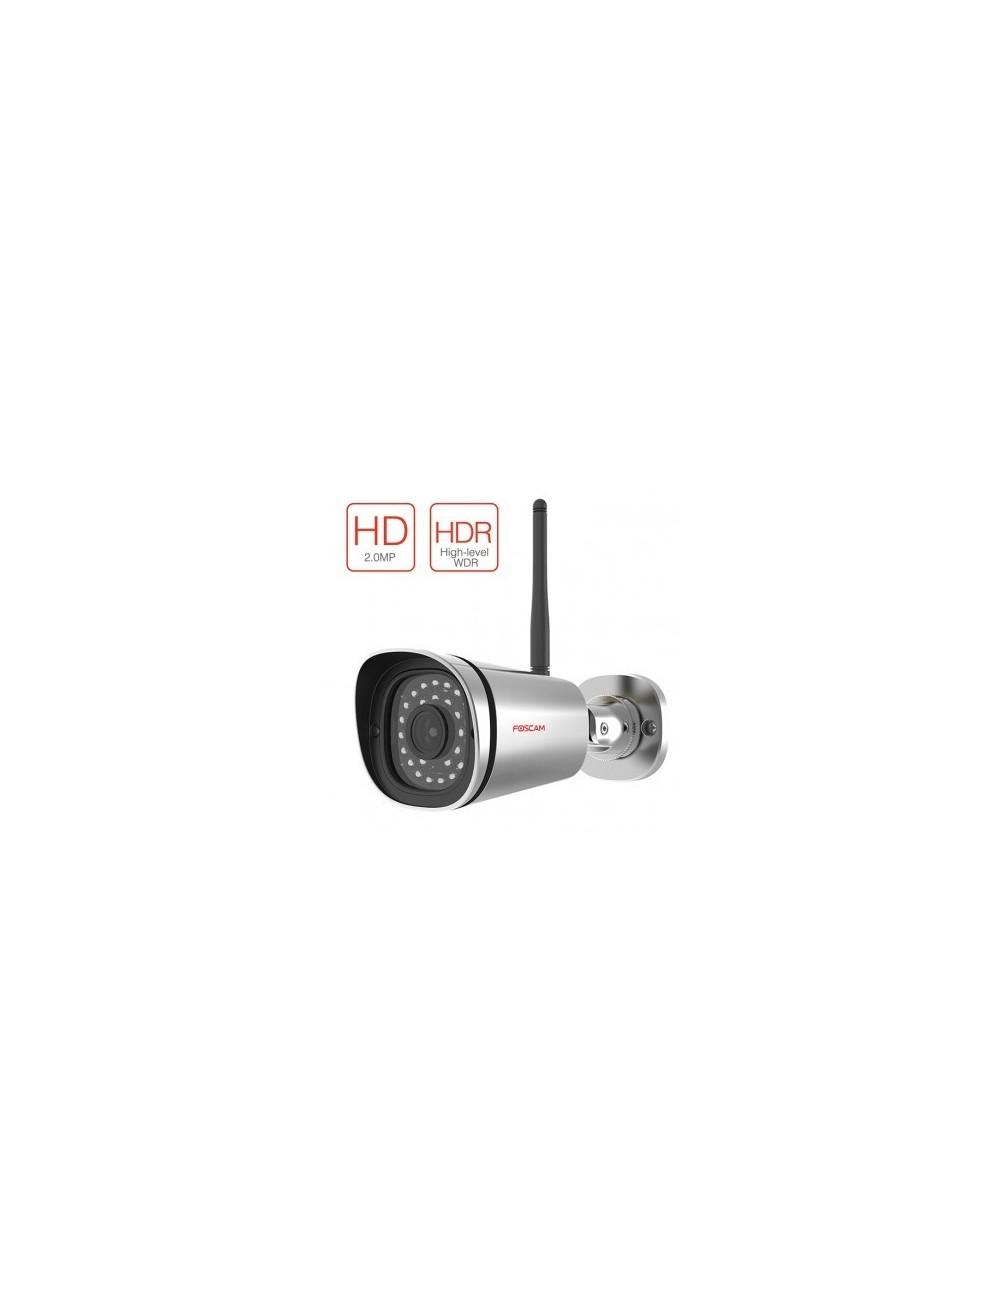 Foscam FI9900P 2.0 Megapixel Camera